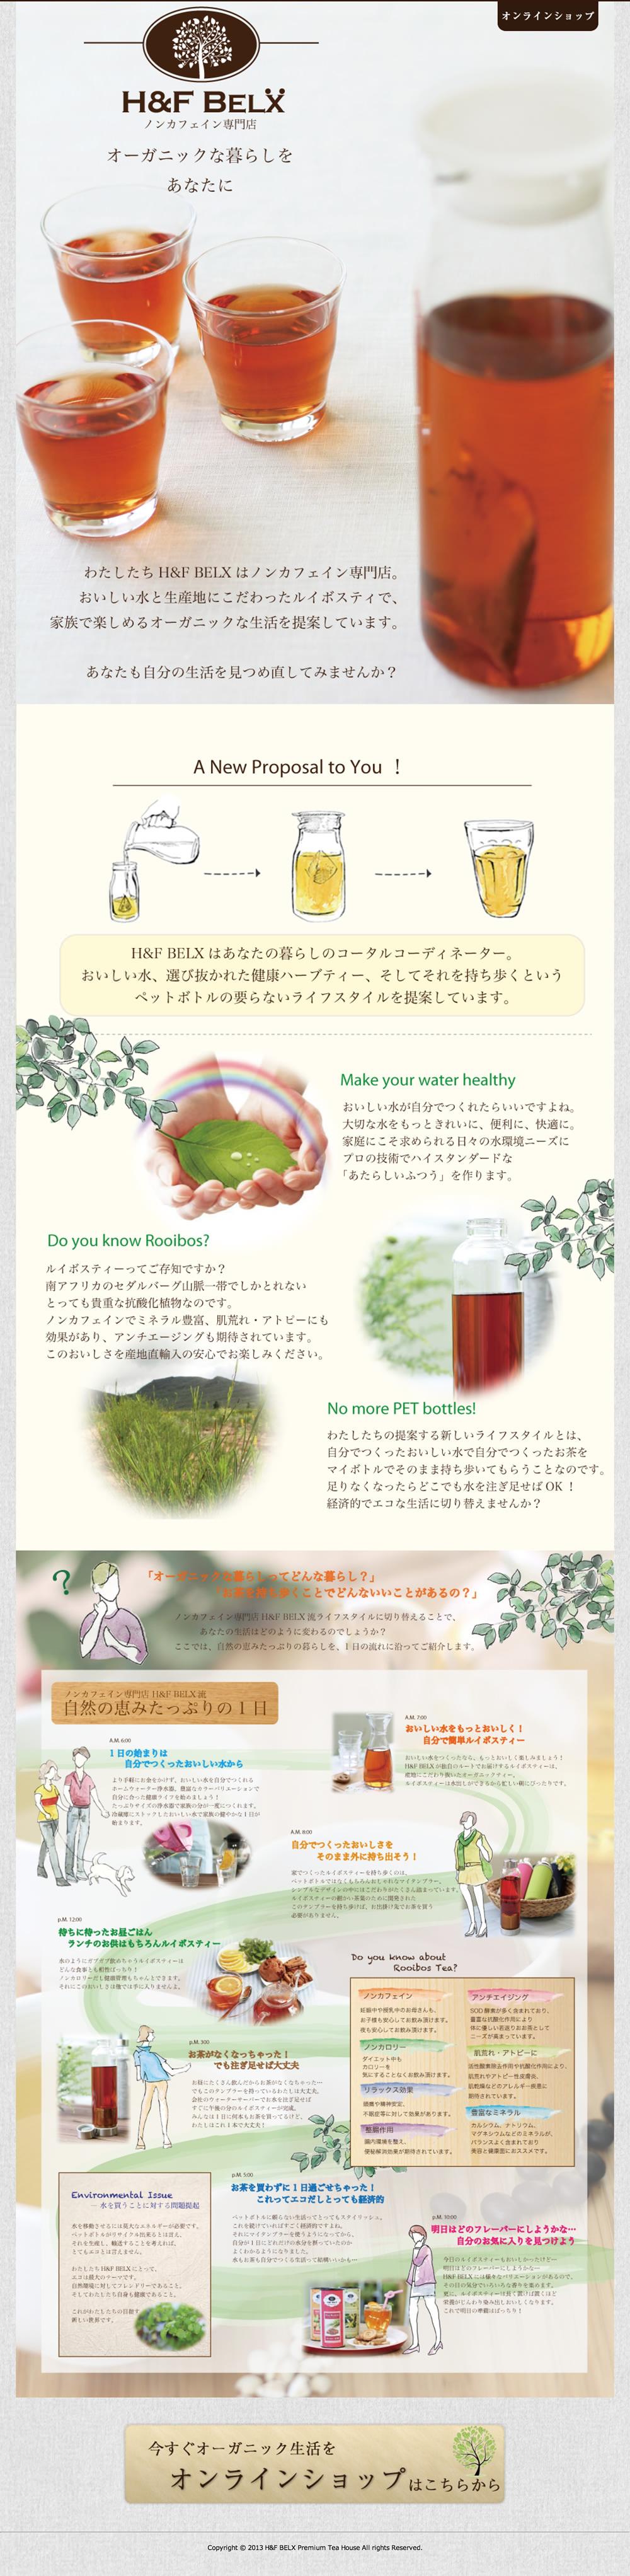 HF-BELX-Premium-Tea-House-HF-BELX-Premium-Tea-House-20130909